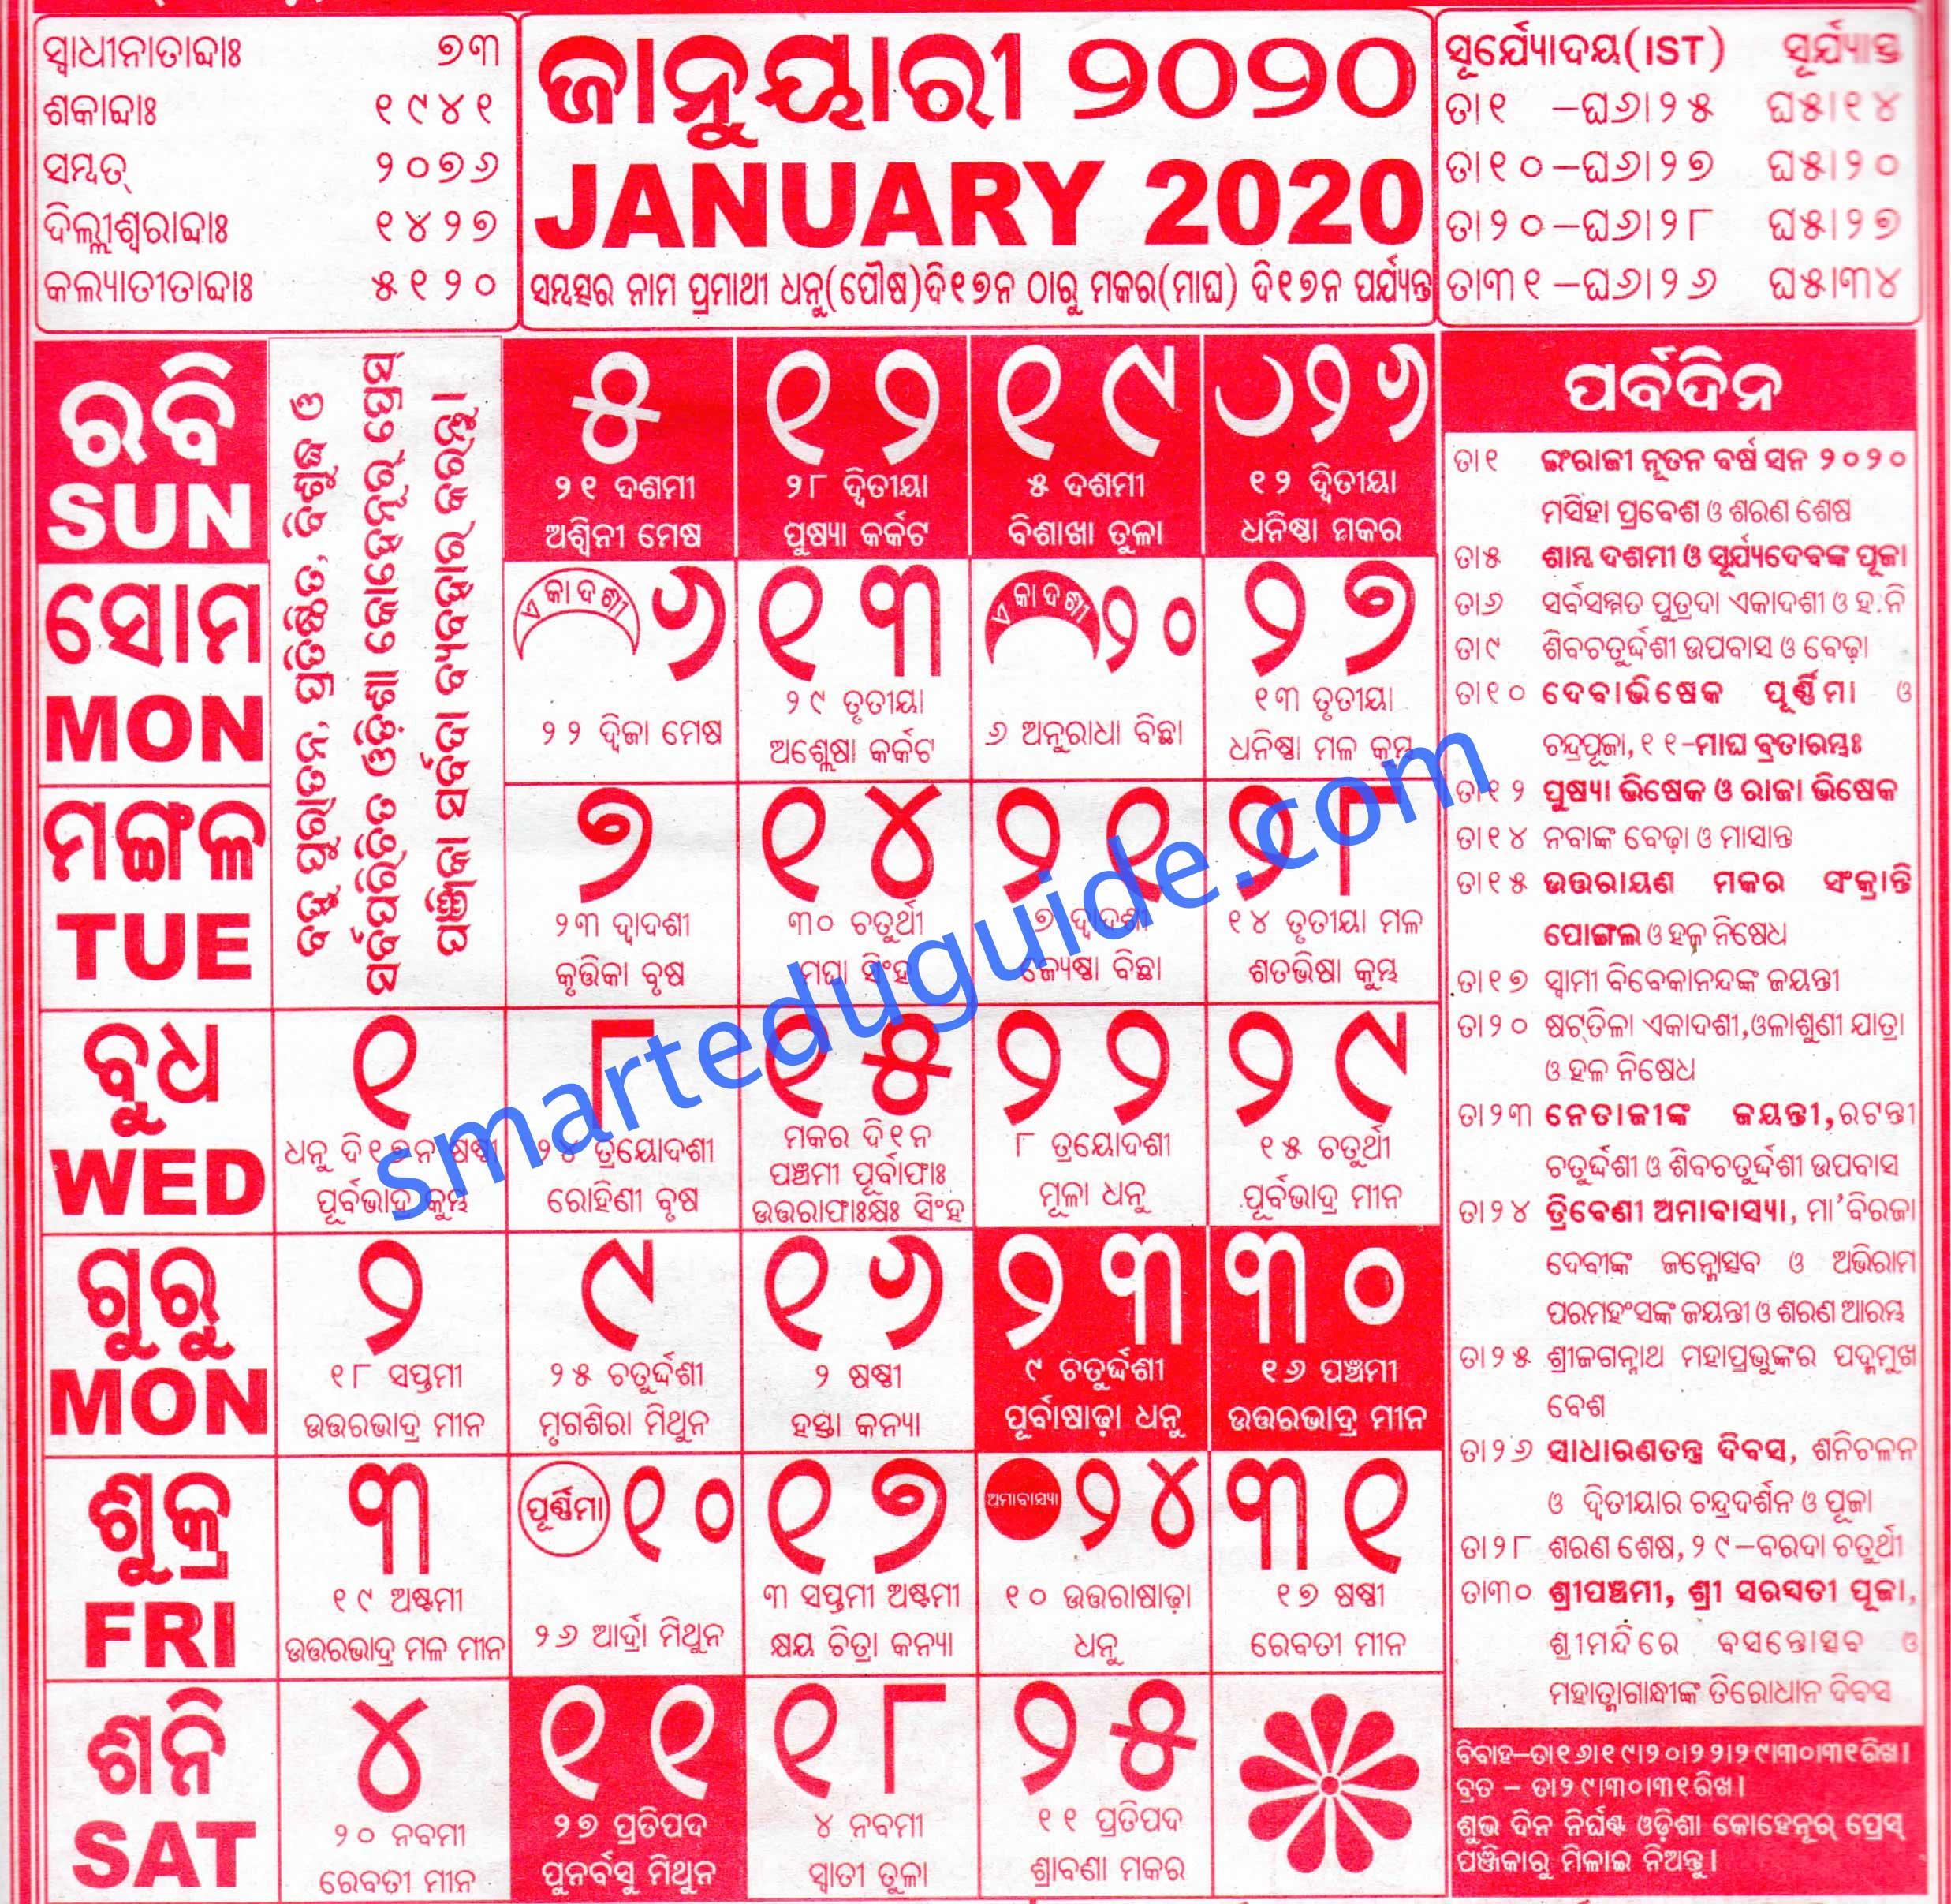 Odia Calendar 2020 Kohinoor Pdf | Seg inside July 2020 Odia Calendar